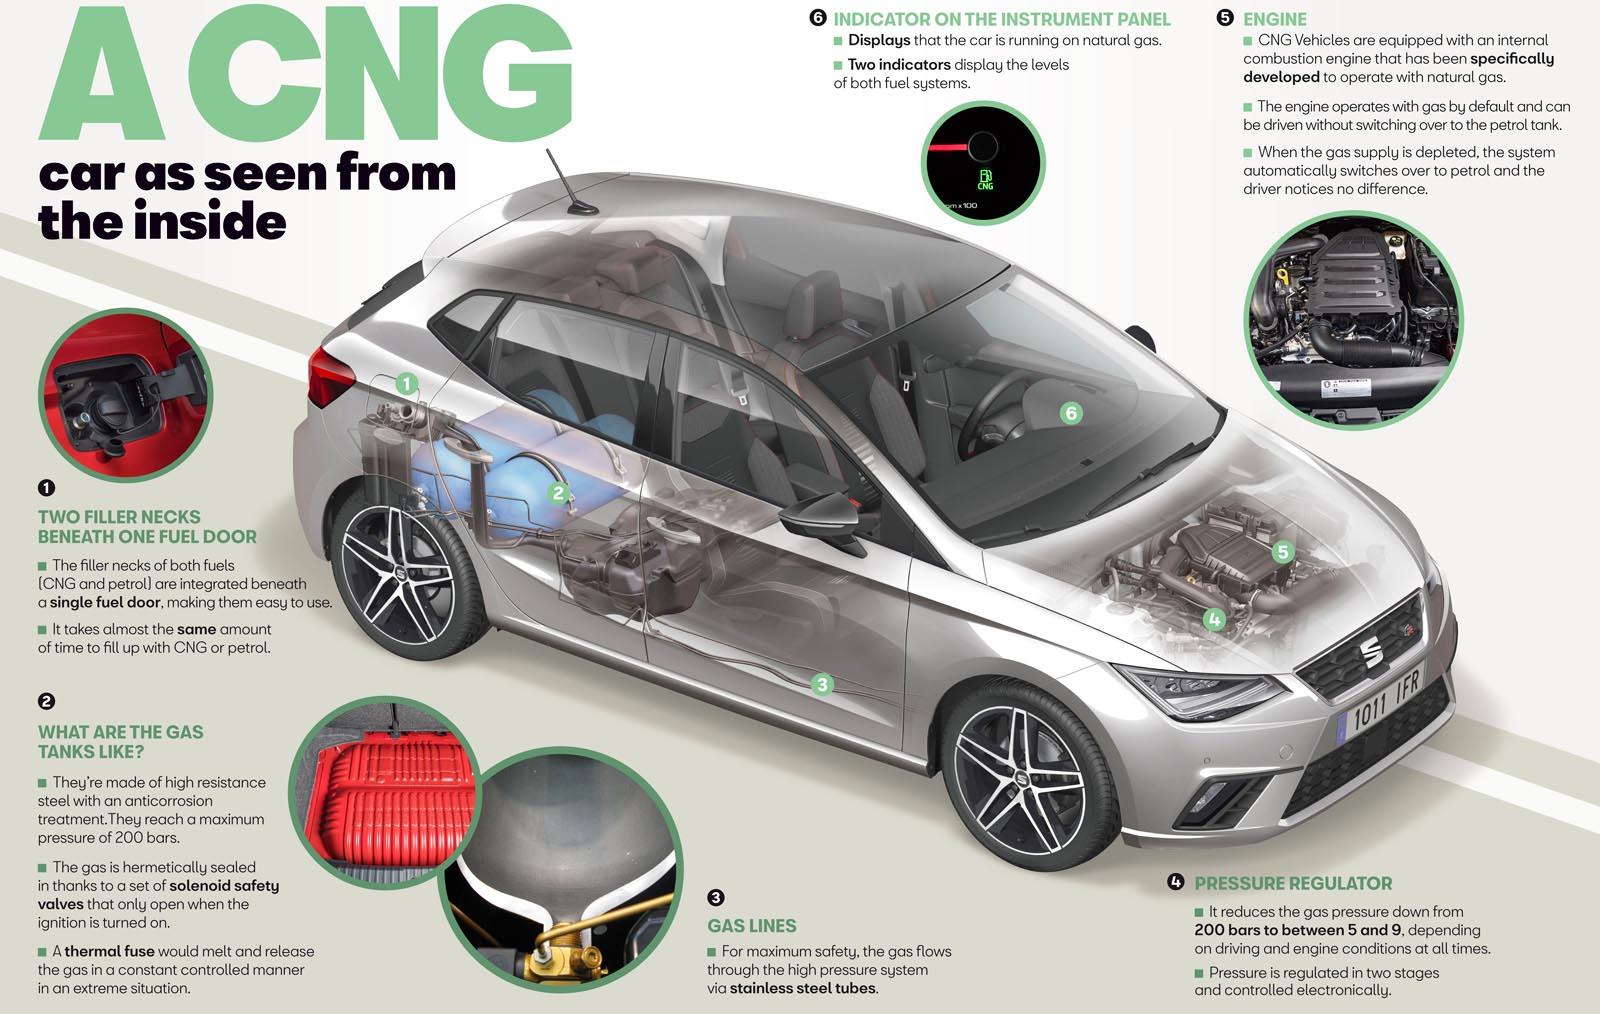 Photo of SEAT: Η τεχνολογία ενός αυτοκινήτου CNG από μέσα